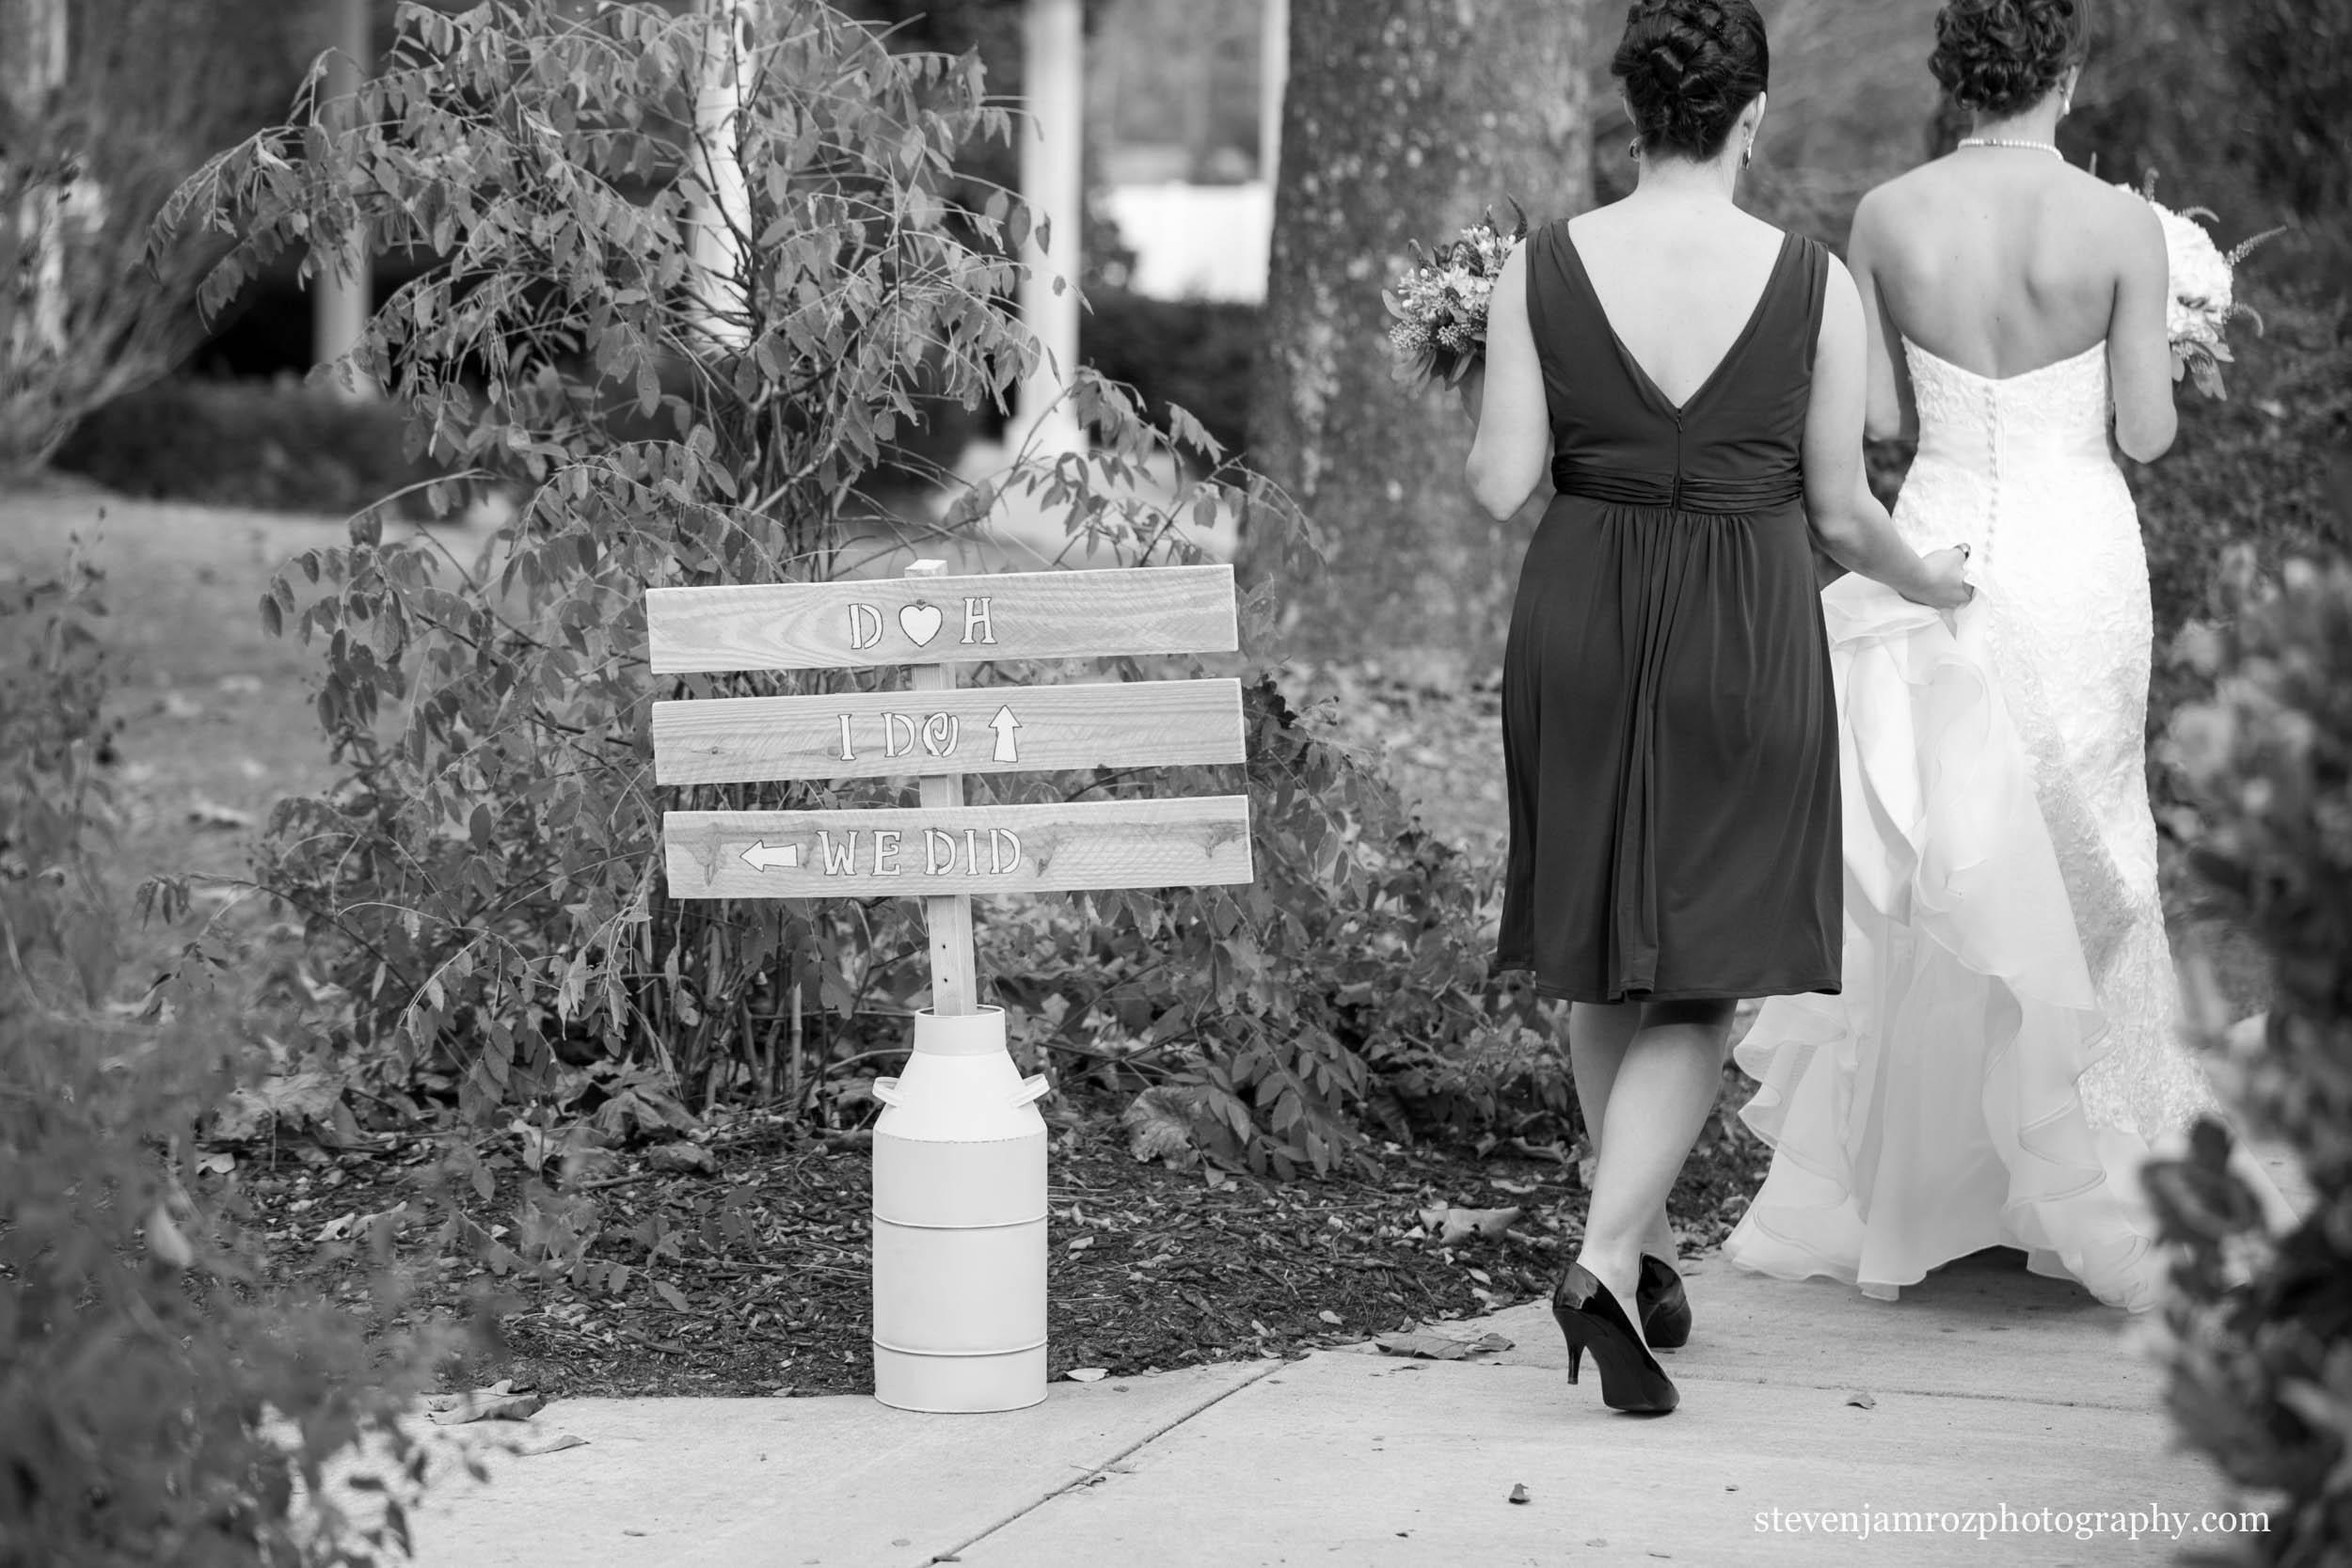 almost-ceremony-time-hudson-manor-estate-steven-jamroz-photography-0025.jpg